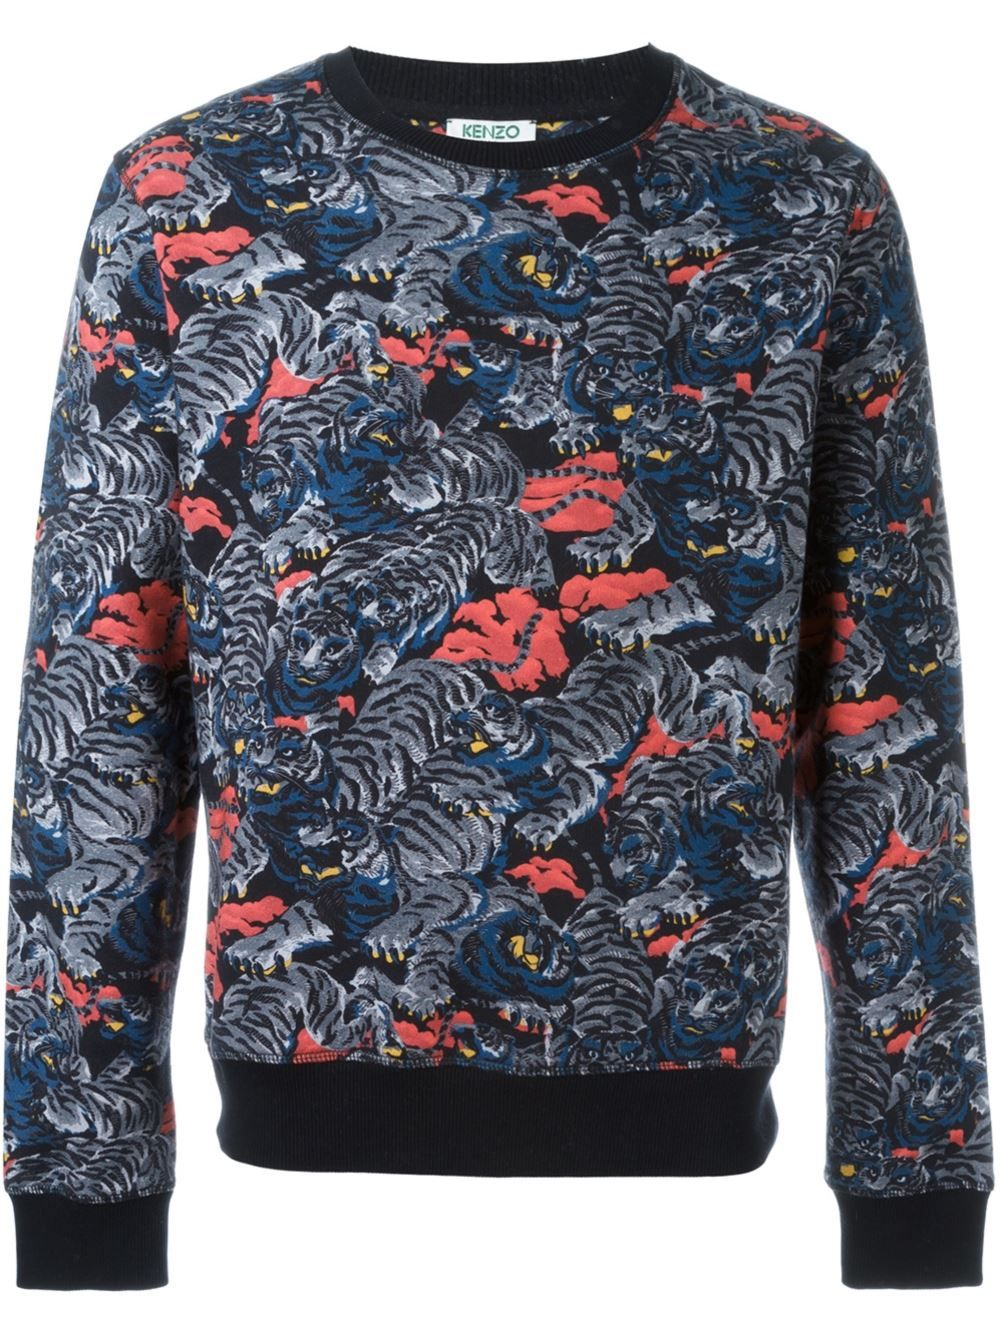 Et Flying Vetements Sweatshirt Boutique TigerKenzo 4RLj5A